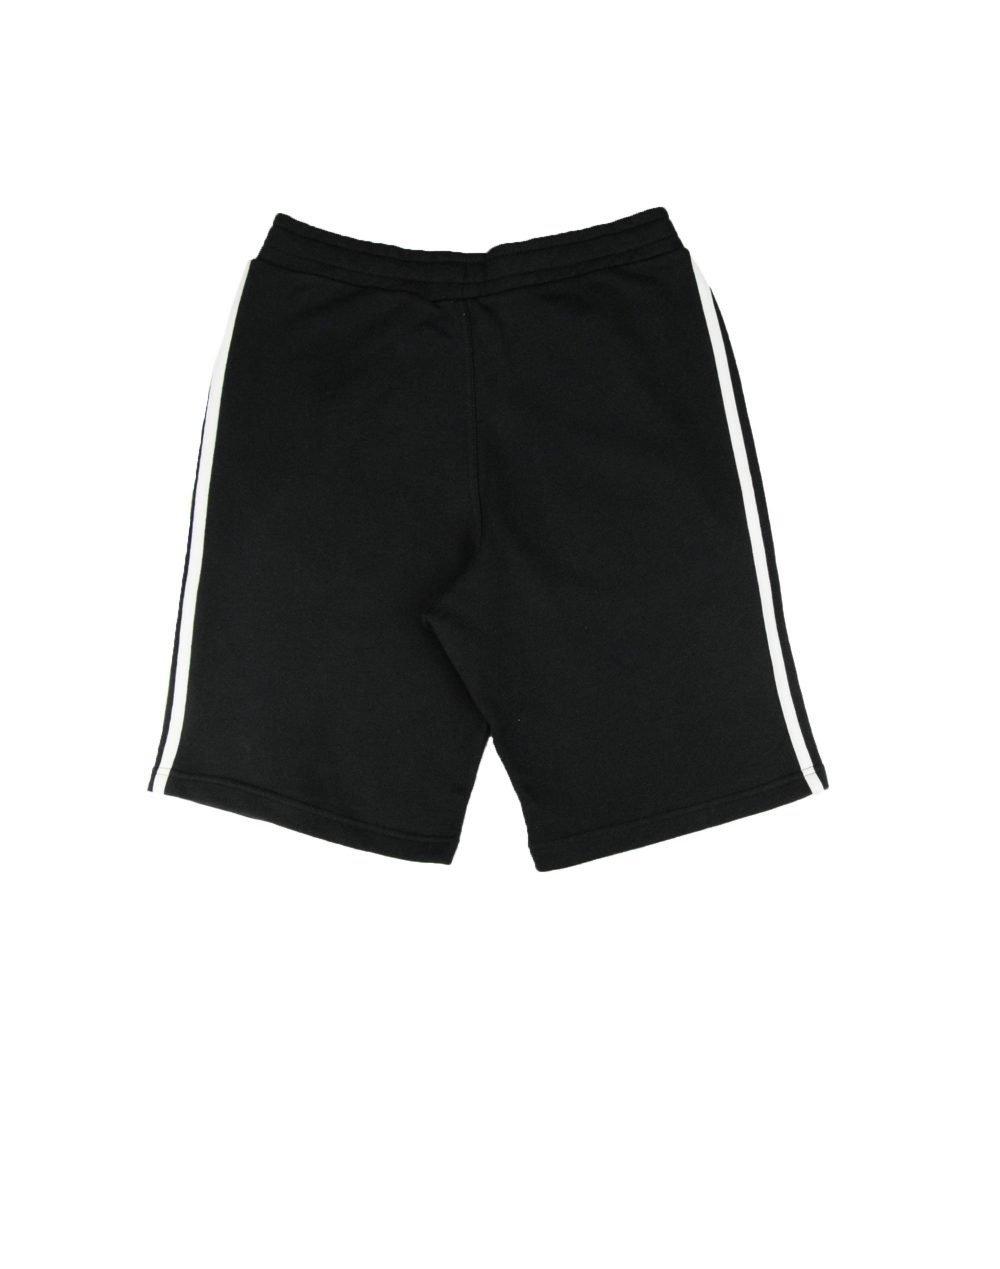 Adidas 3 Stripe Short (DH5798) Black